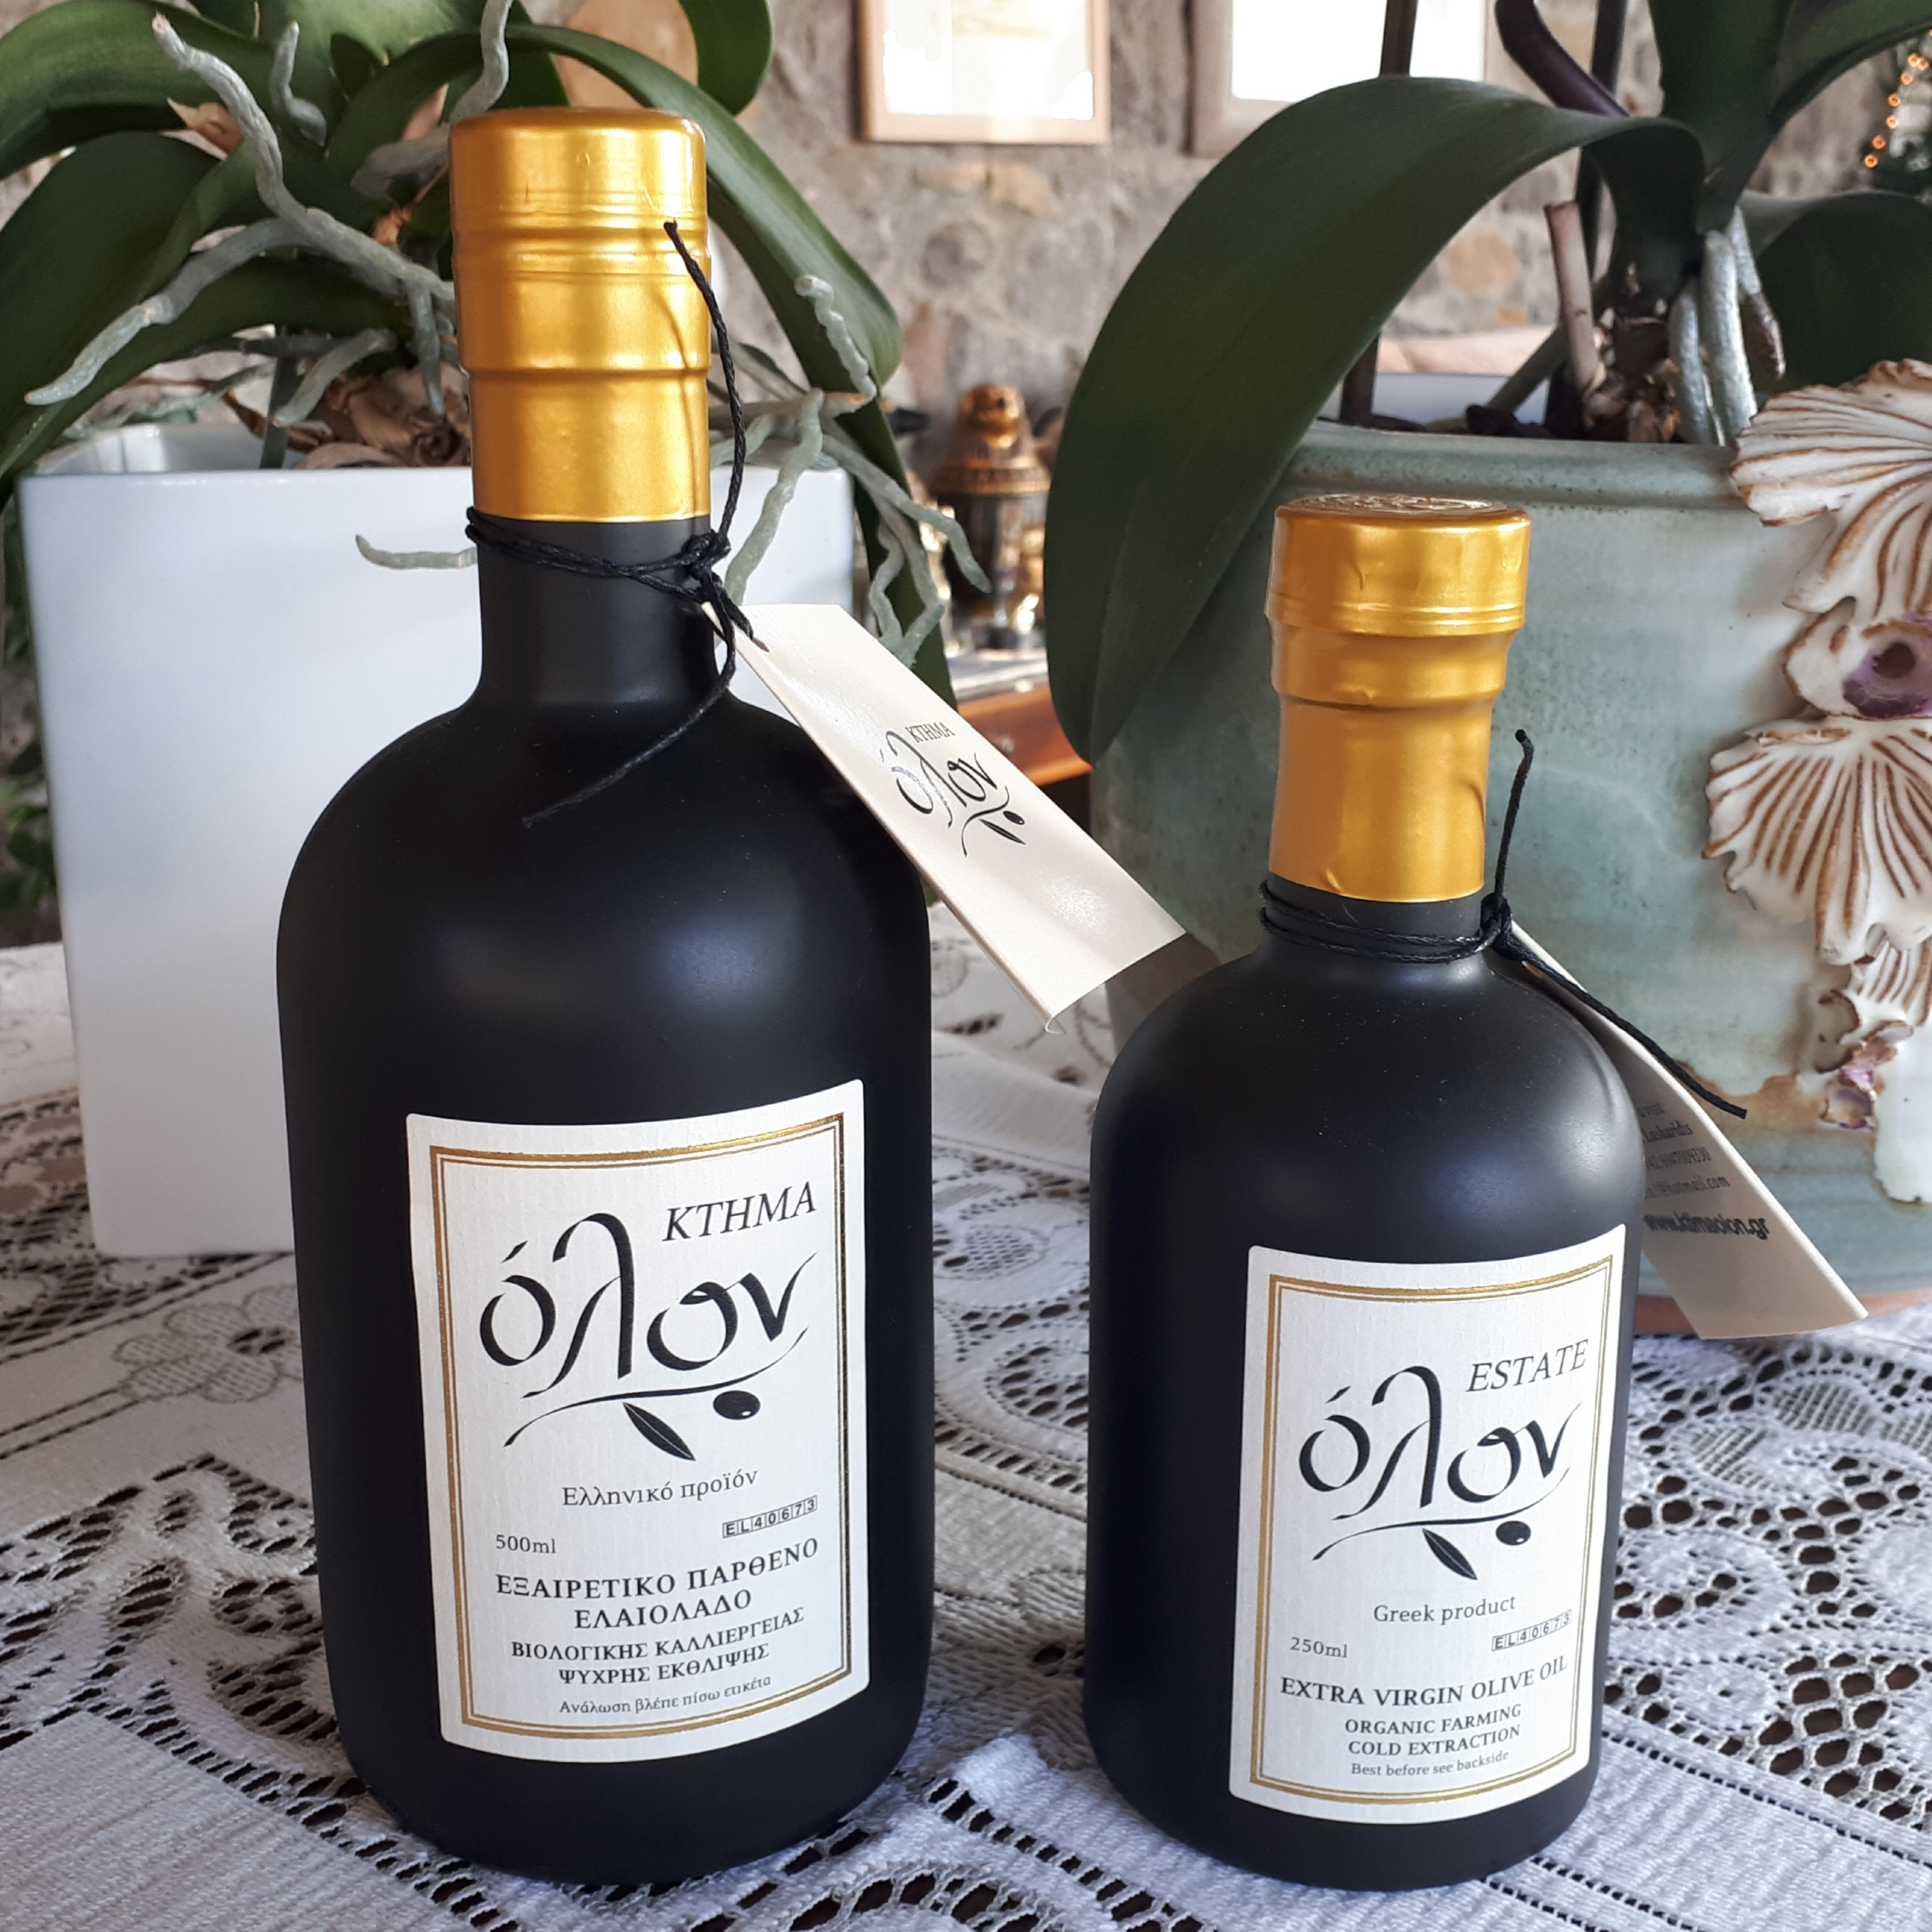 olive oil ktima olon lemnos